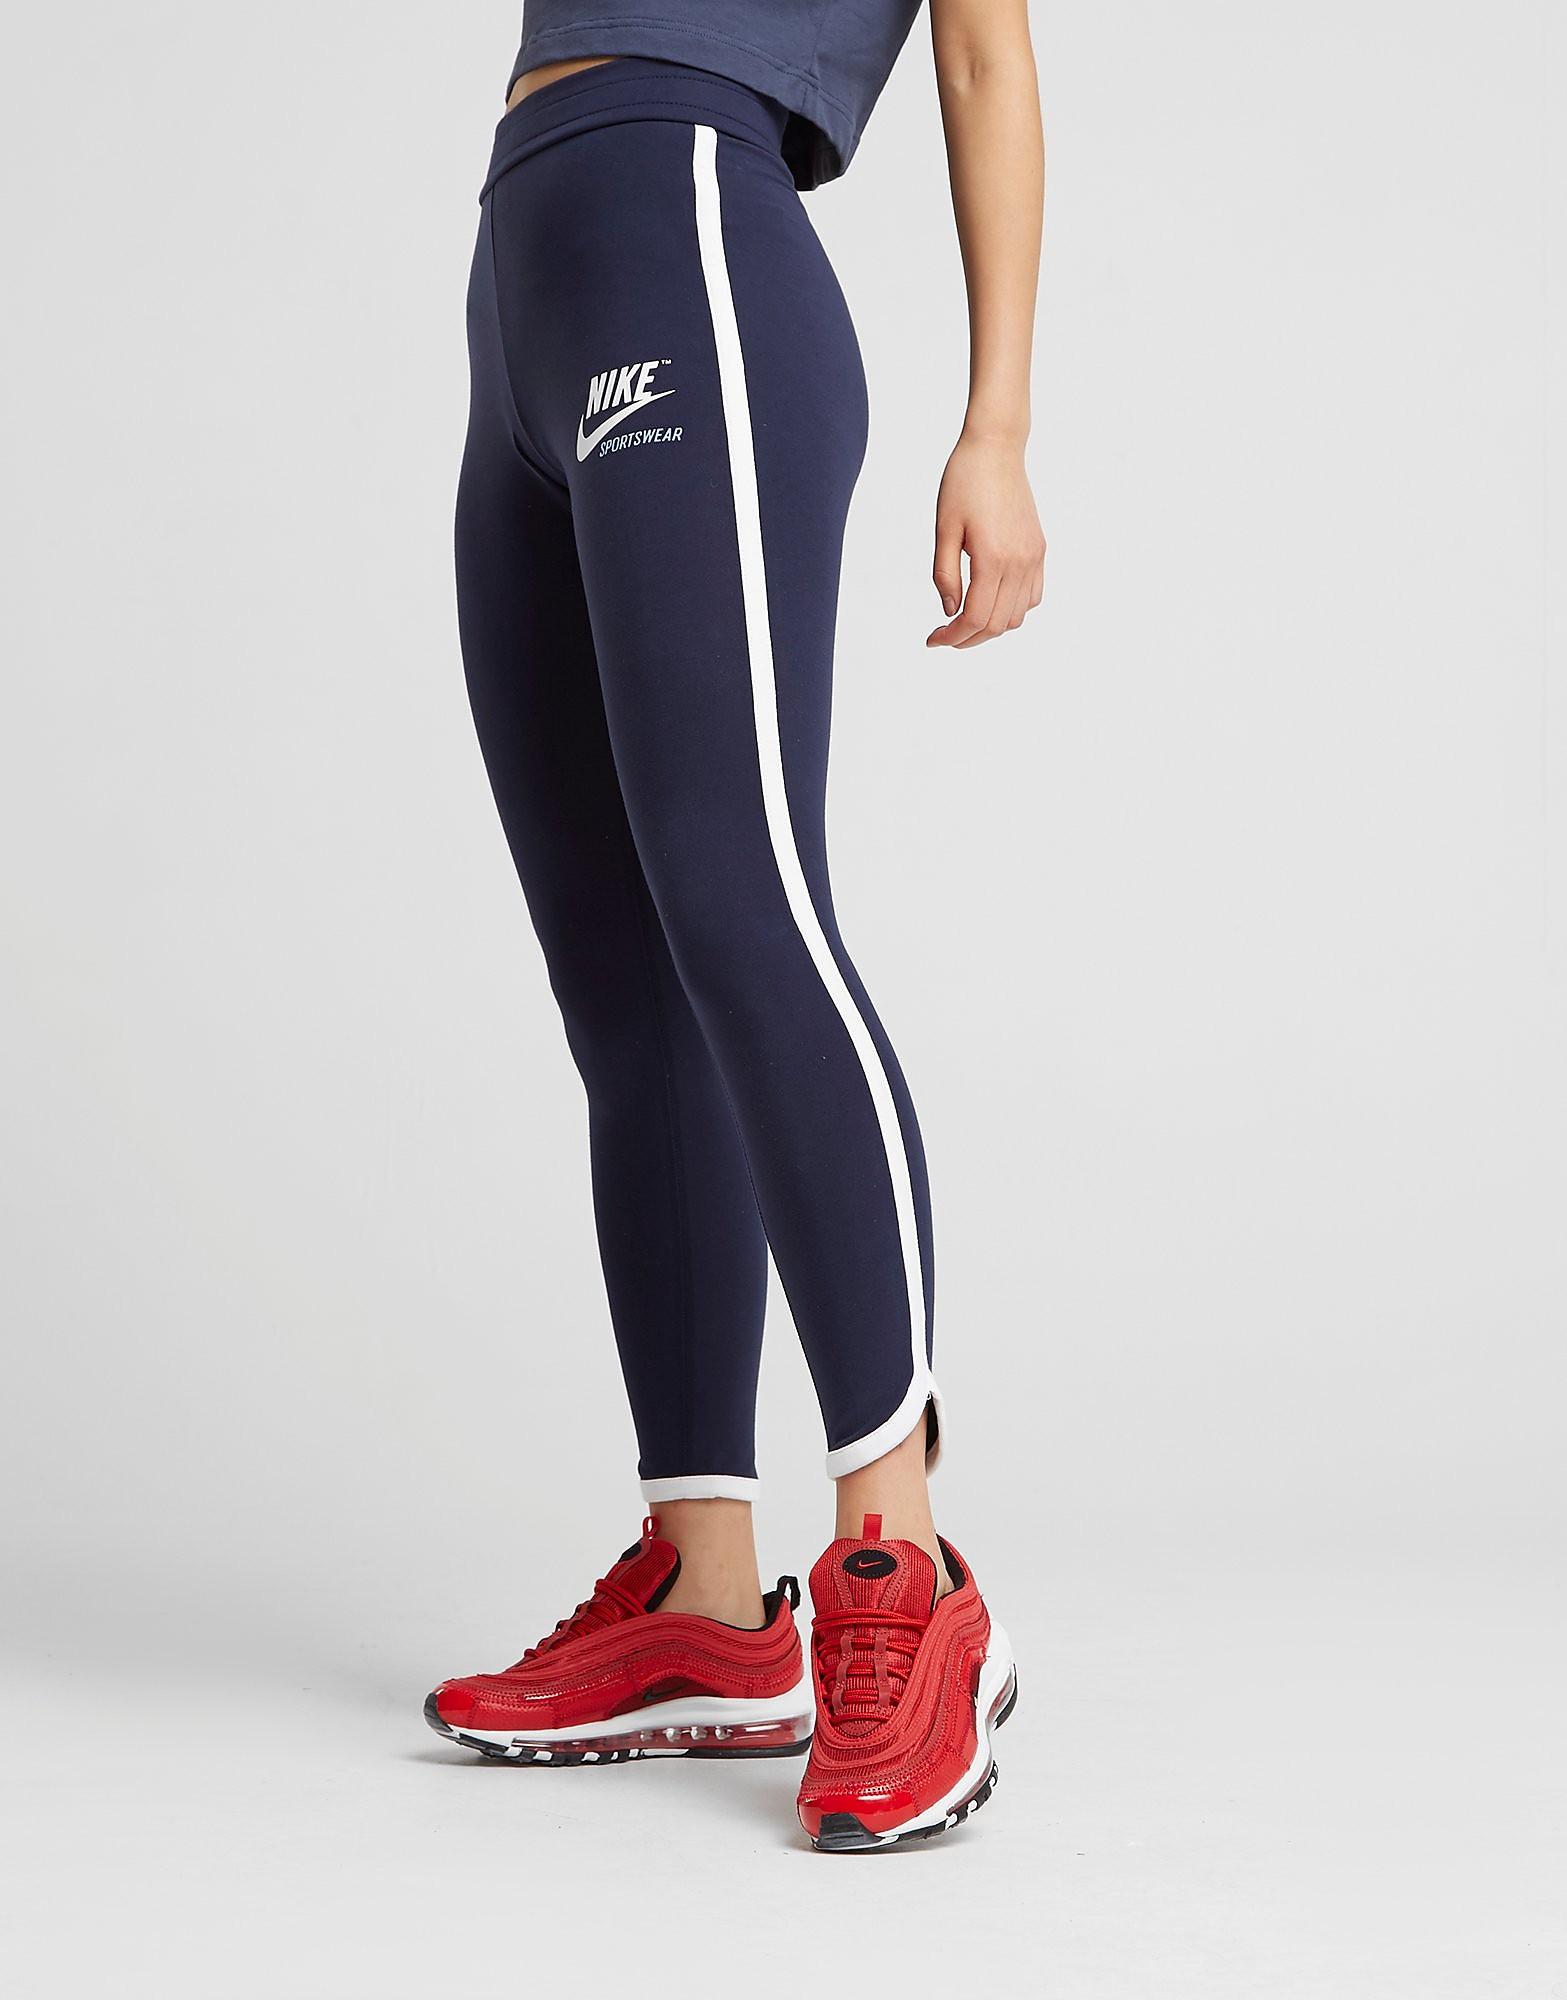 Nike Archive Leggings